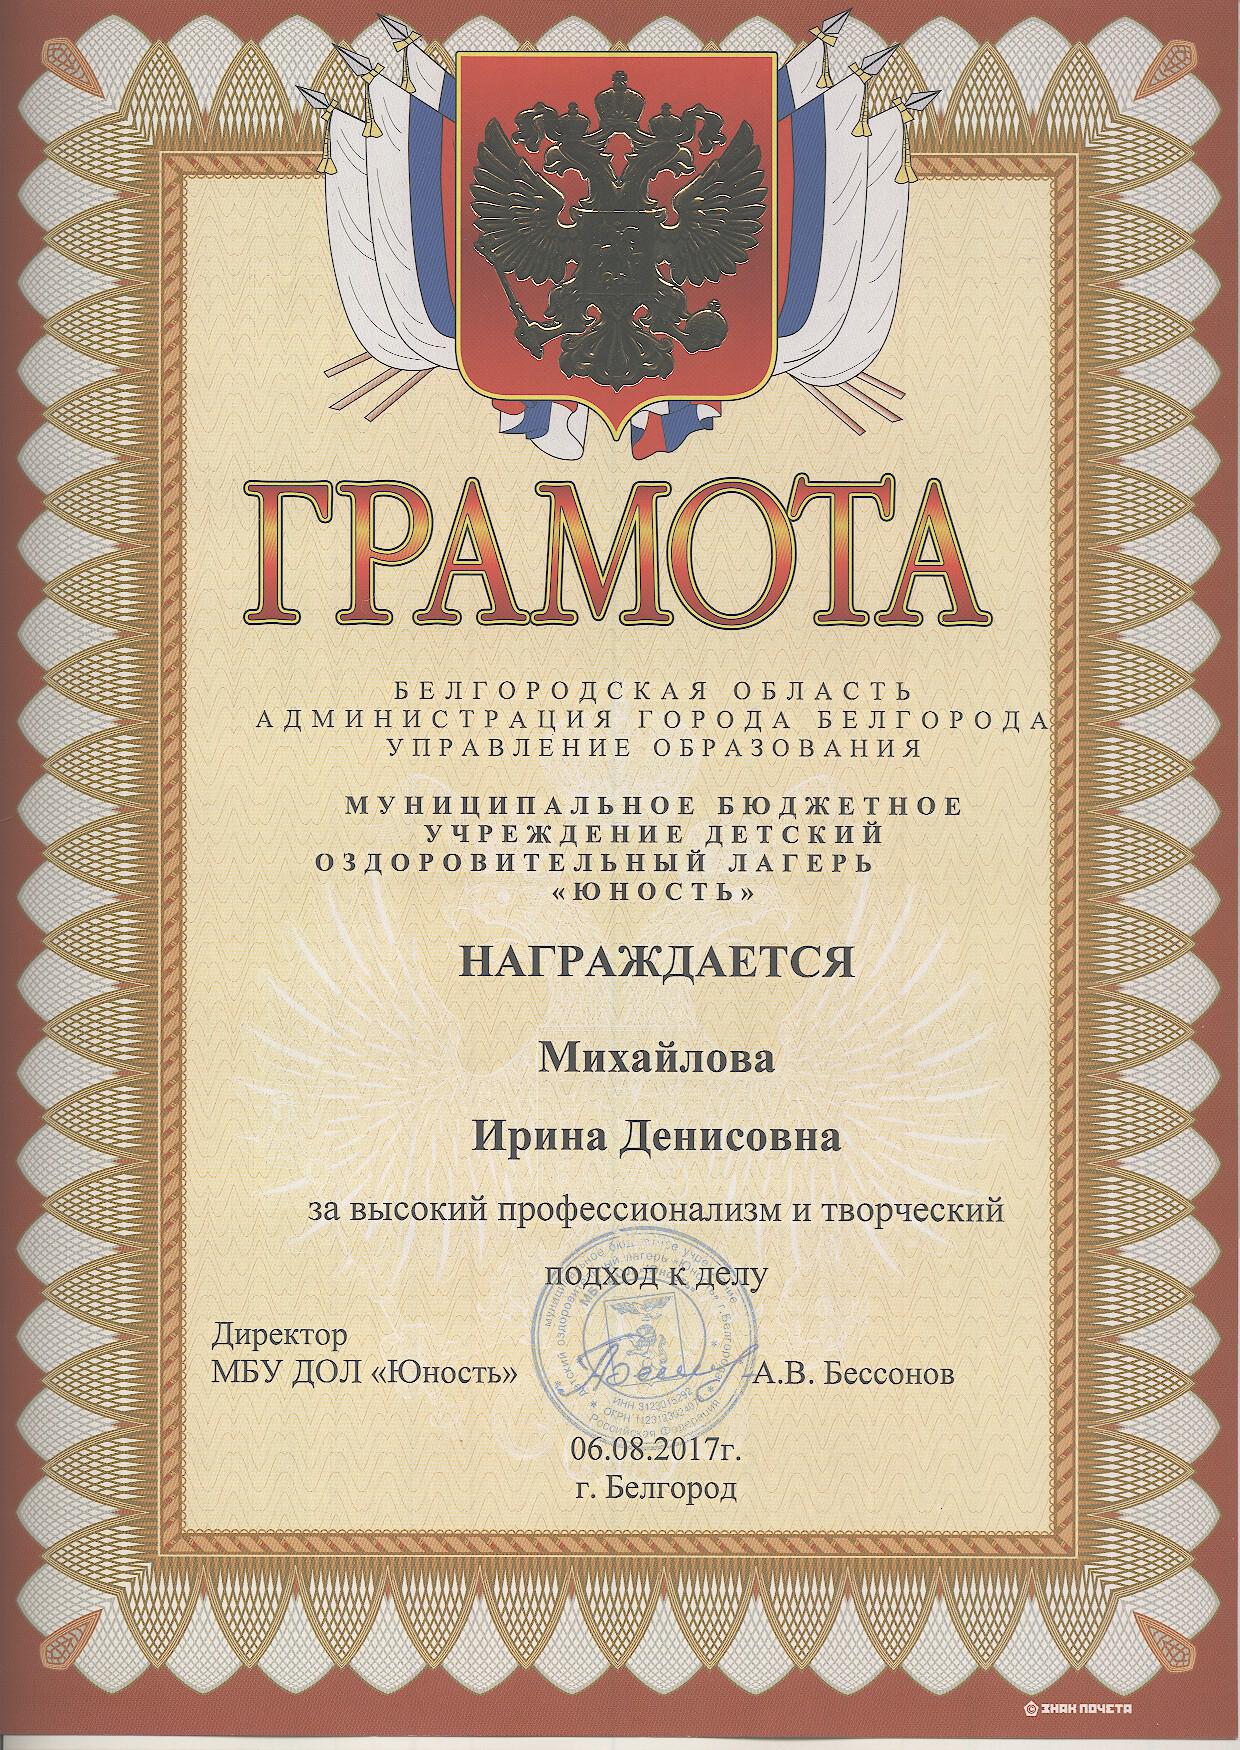 Gramota_1